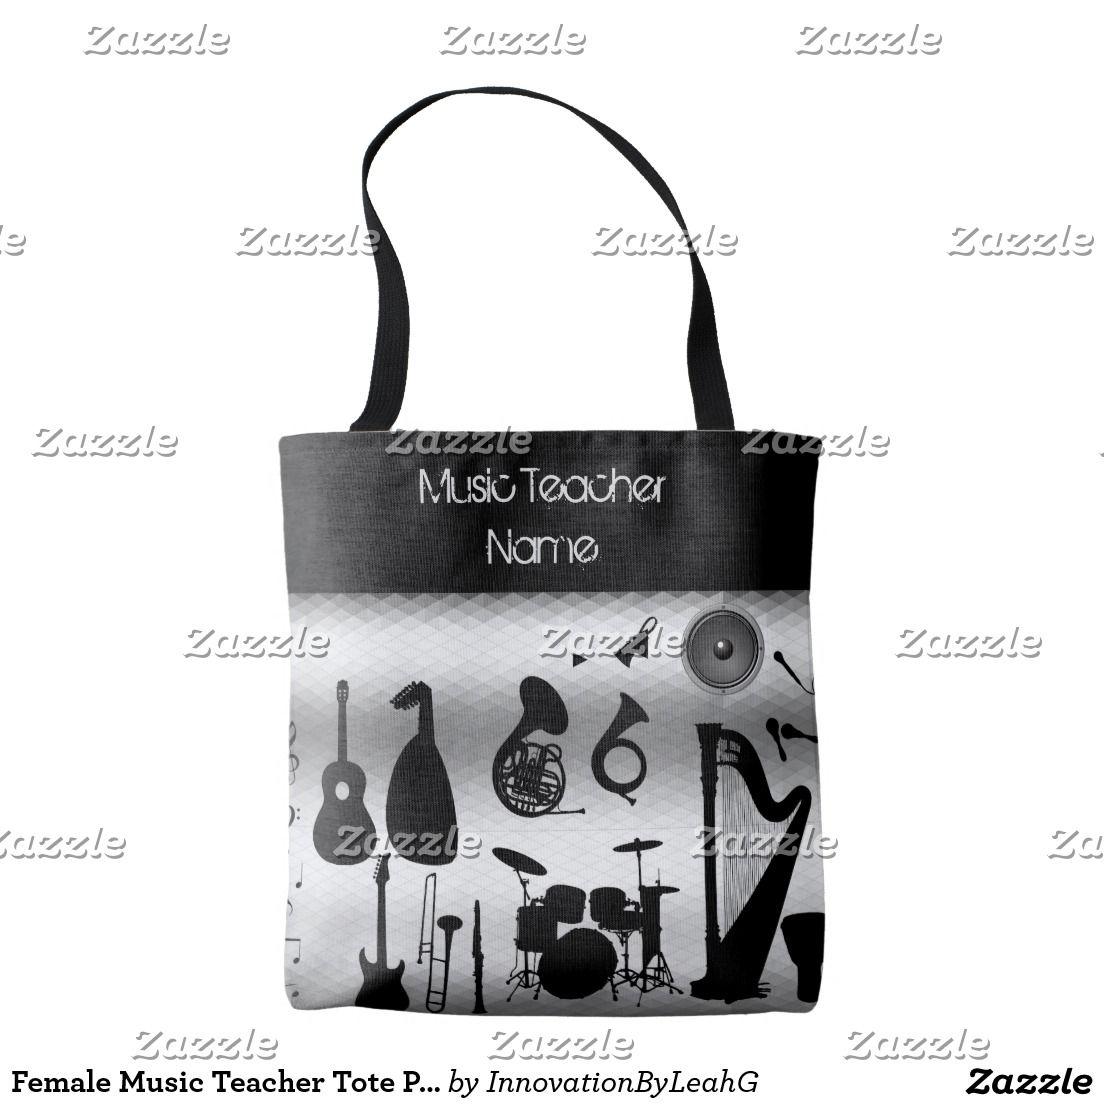 Female Music Teacher Tote Personalized Tote Bag